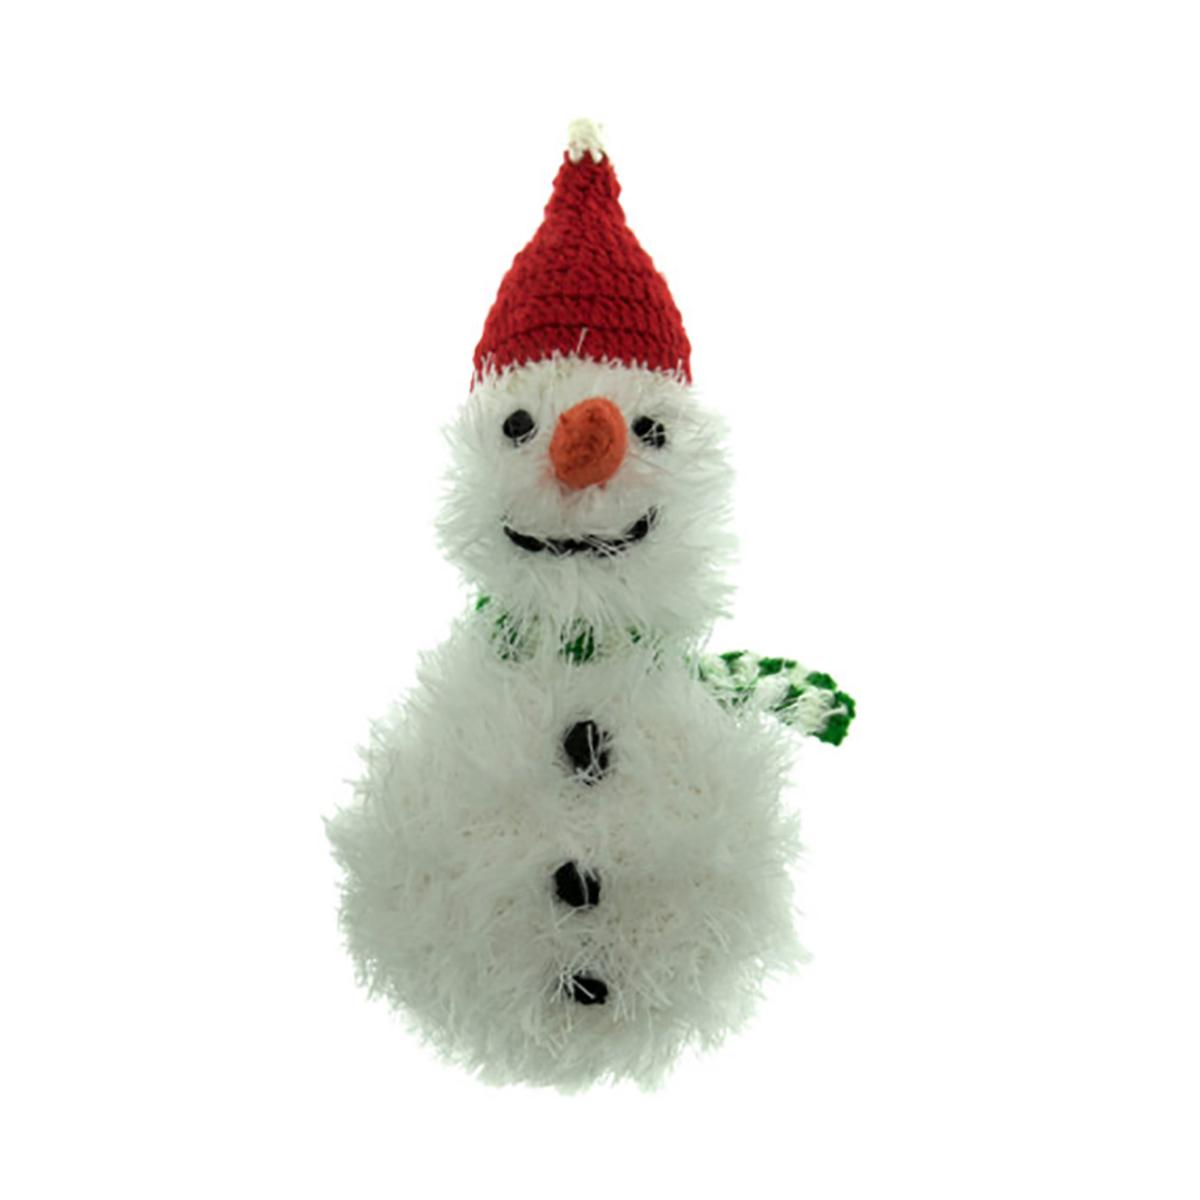 OoMaLoo Handmade Snowman Dog Toy